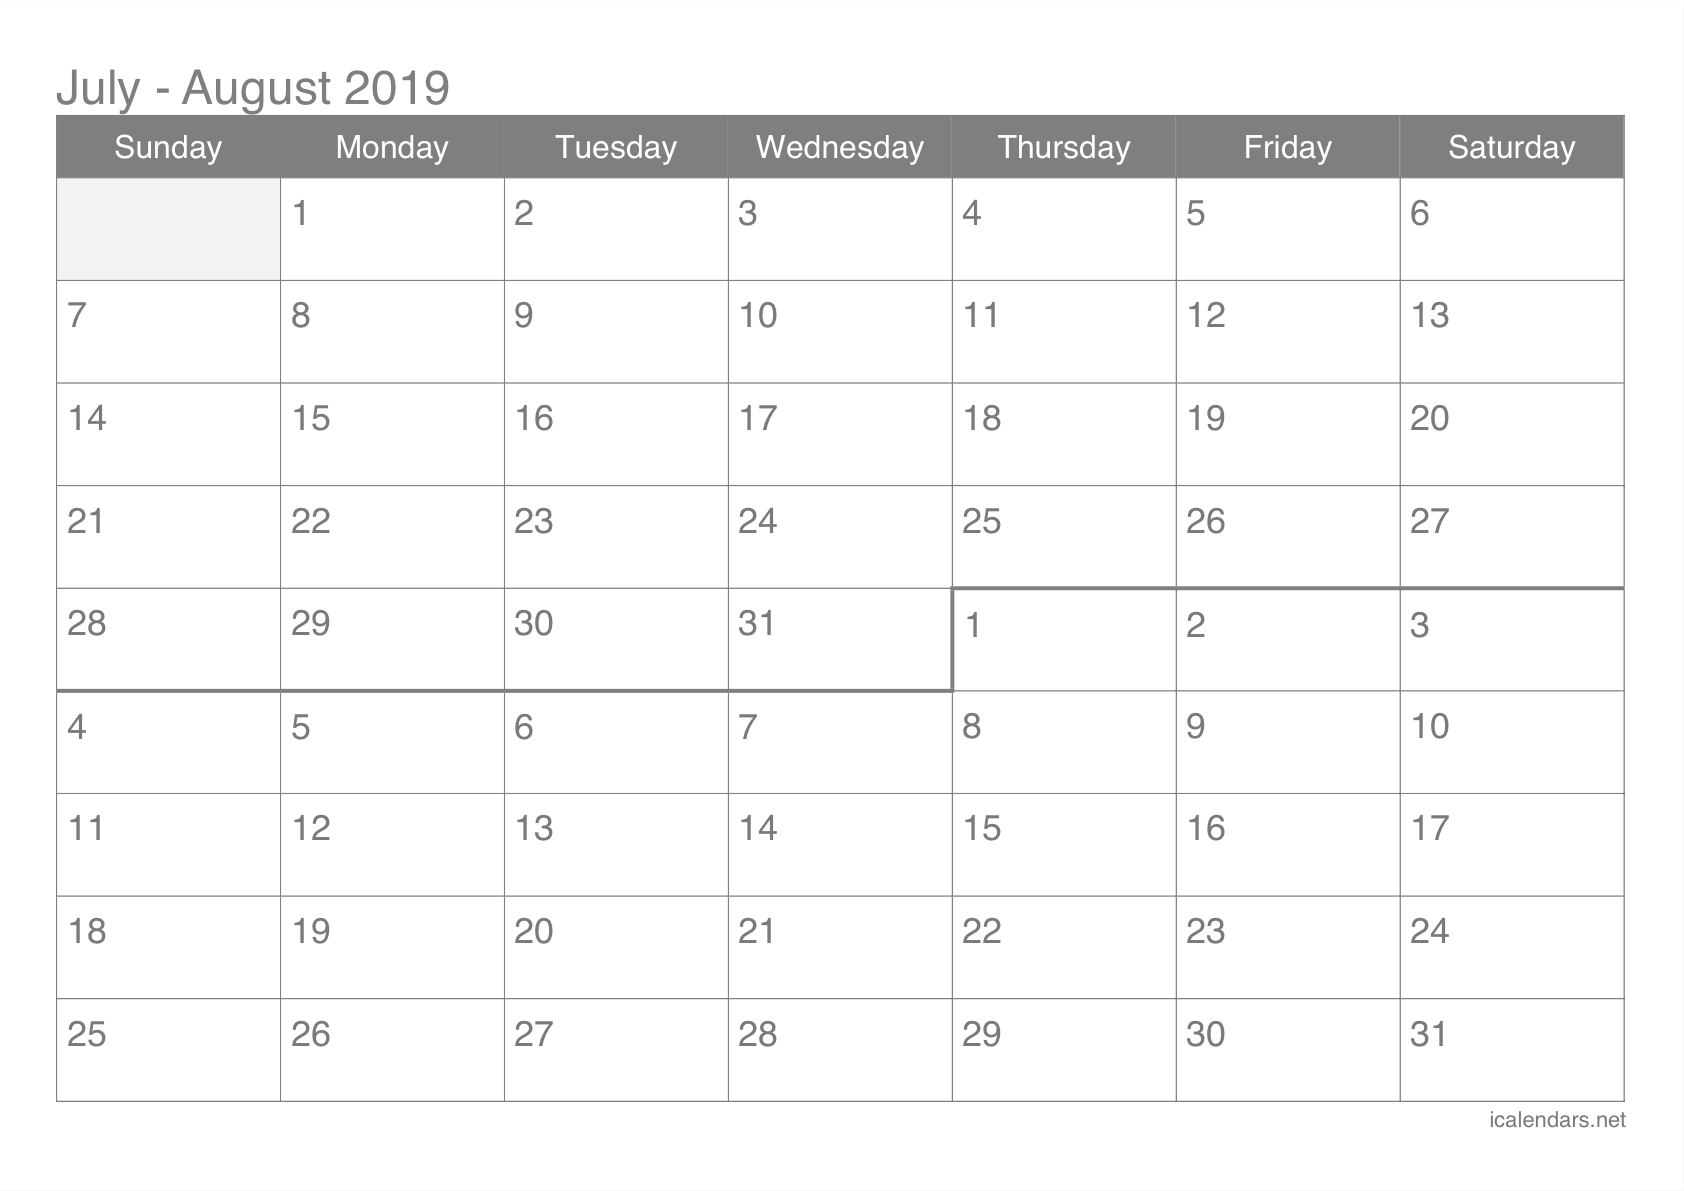 July And August 2019 Printable Calendar - Icalendars July 2 2019 Calendar